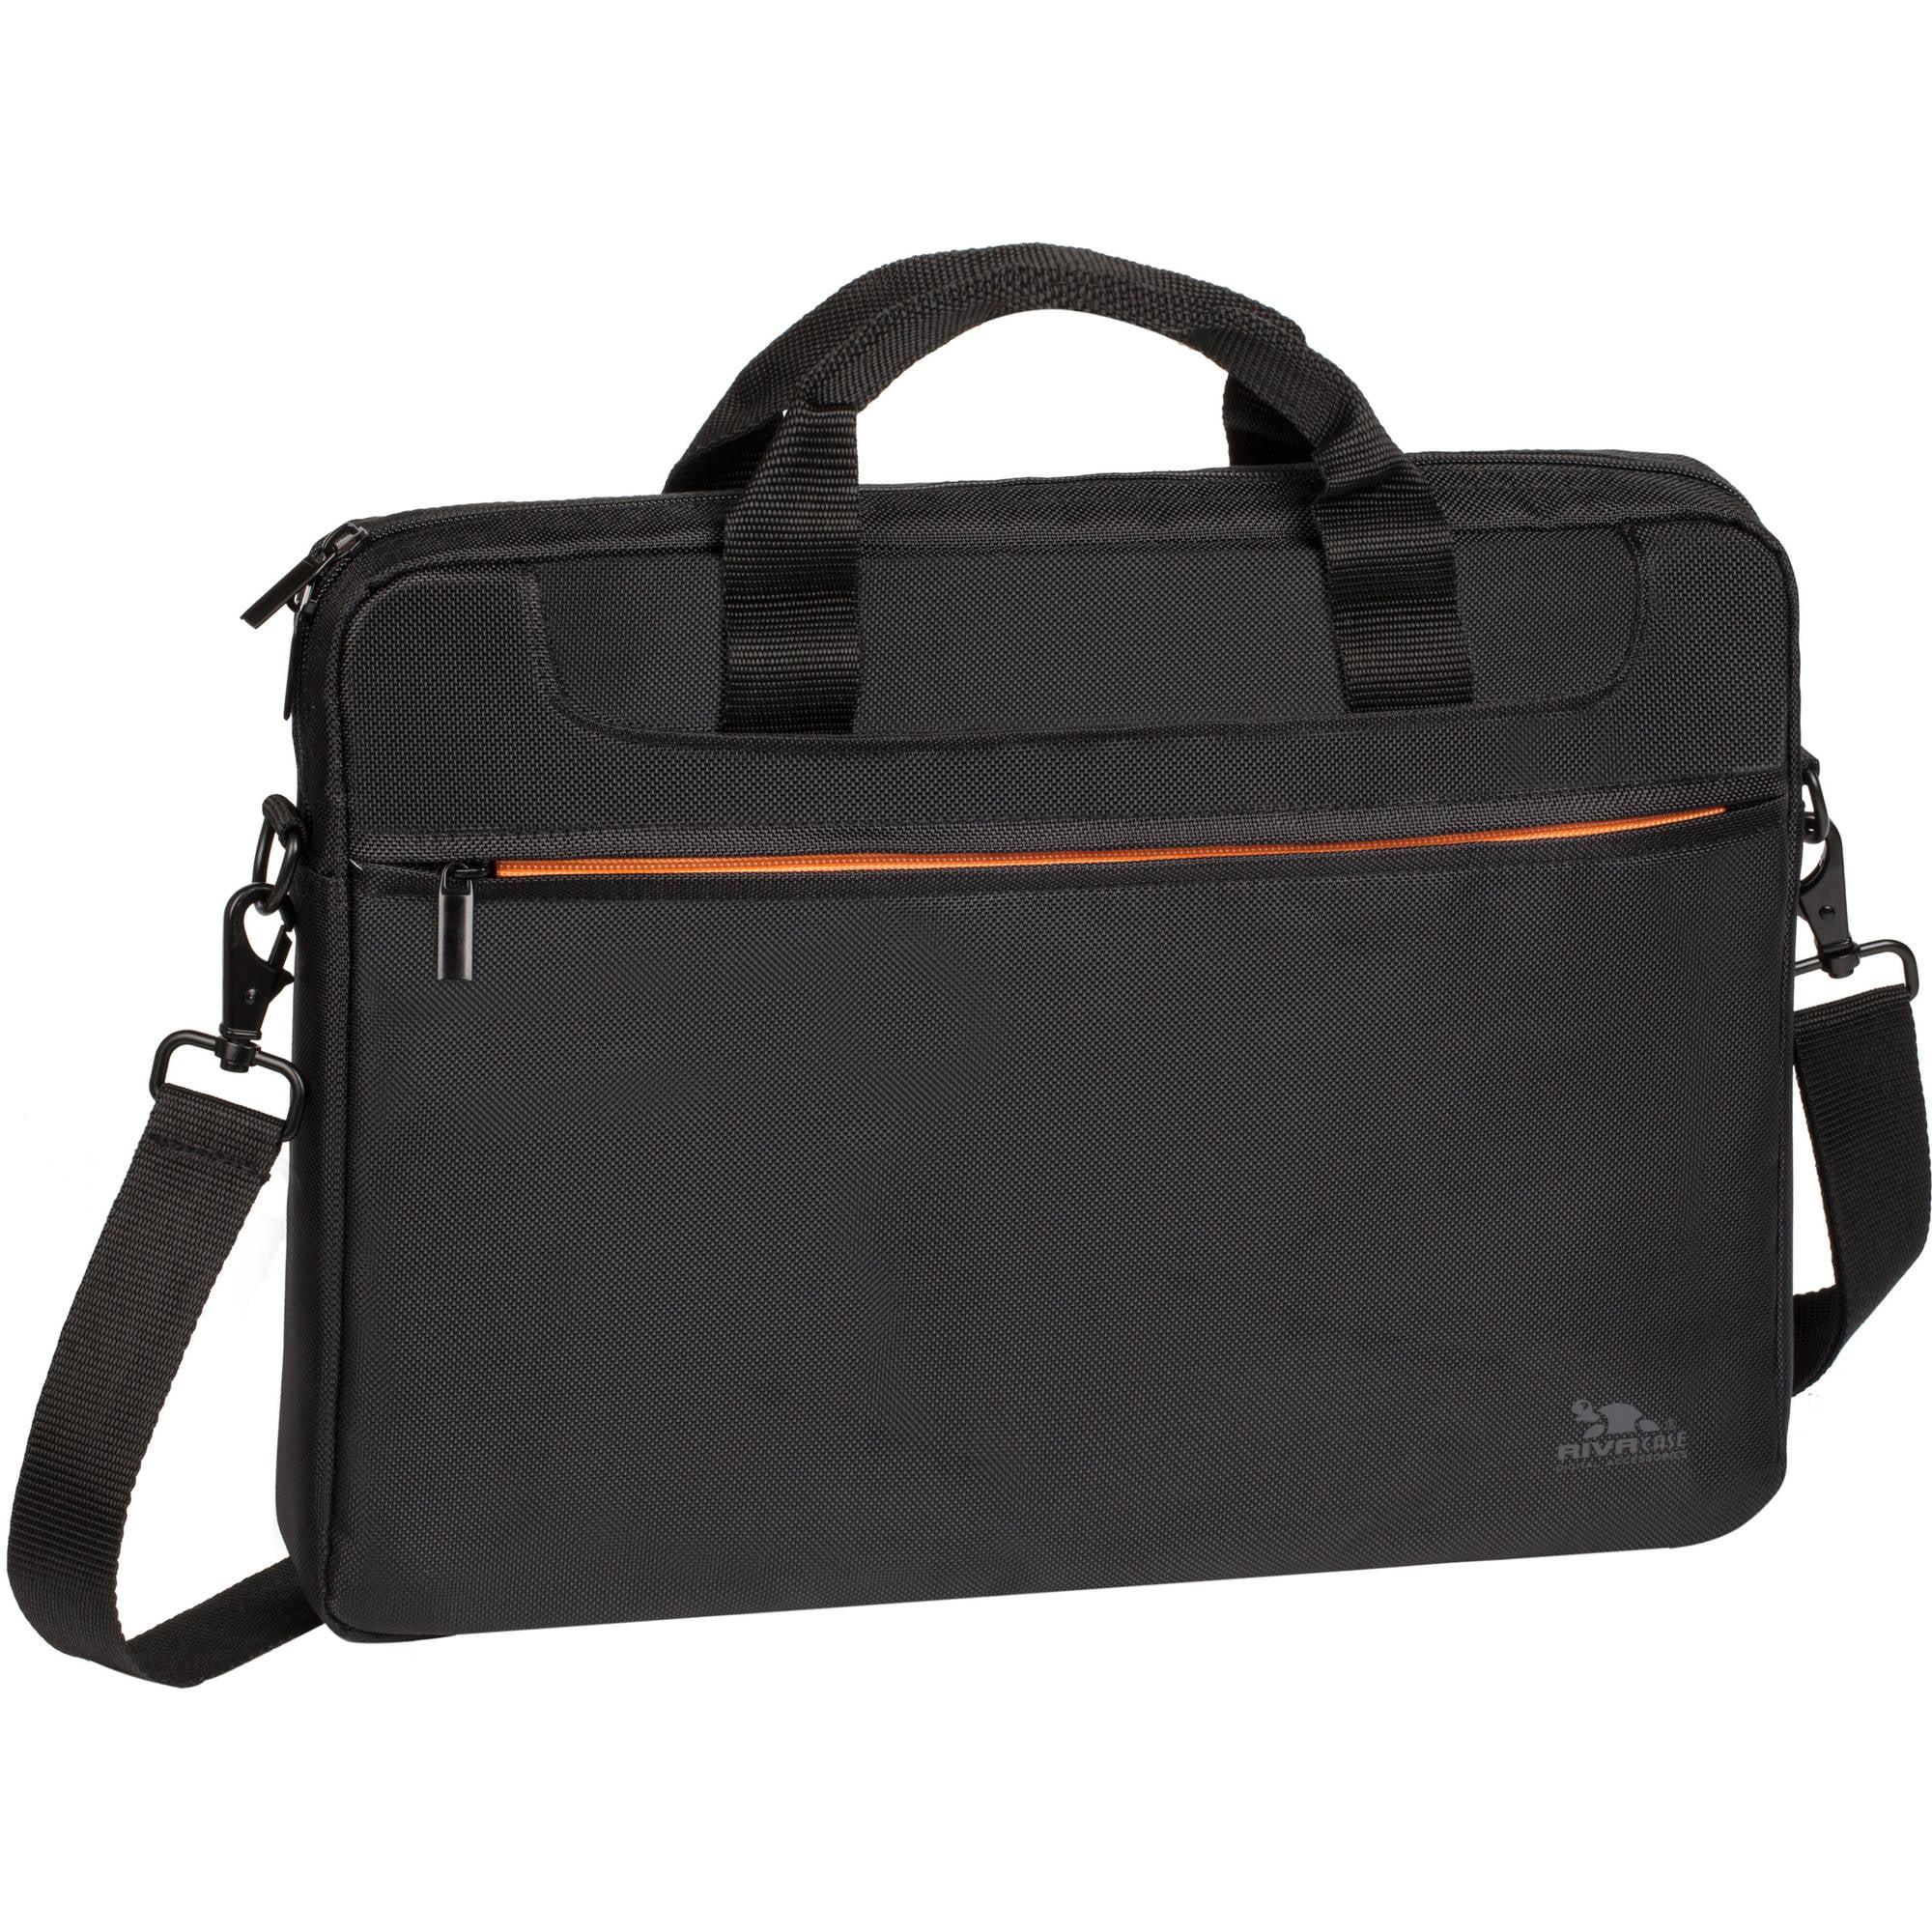 "RIVACASE 15.6"" Laptop Bag 8033, Black"